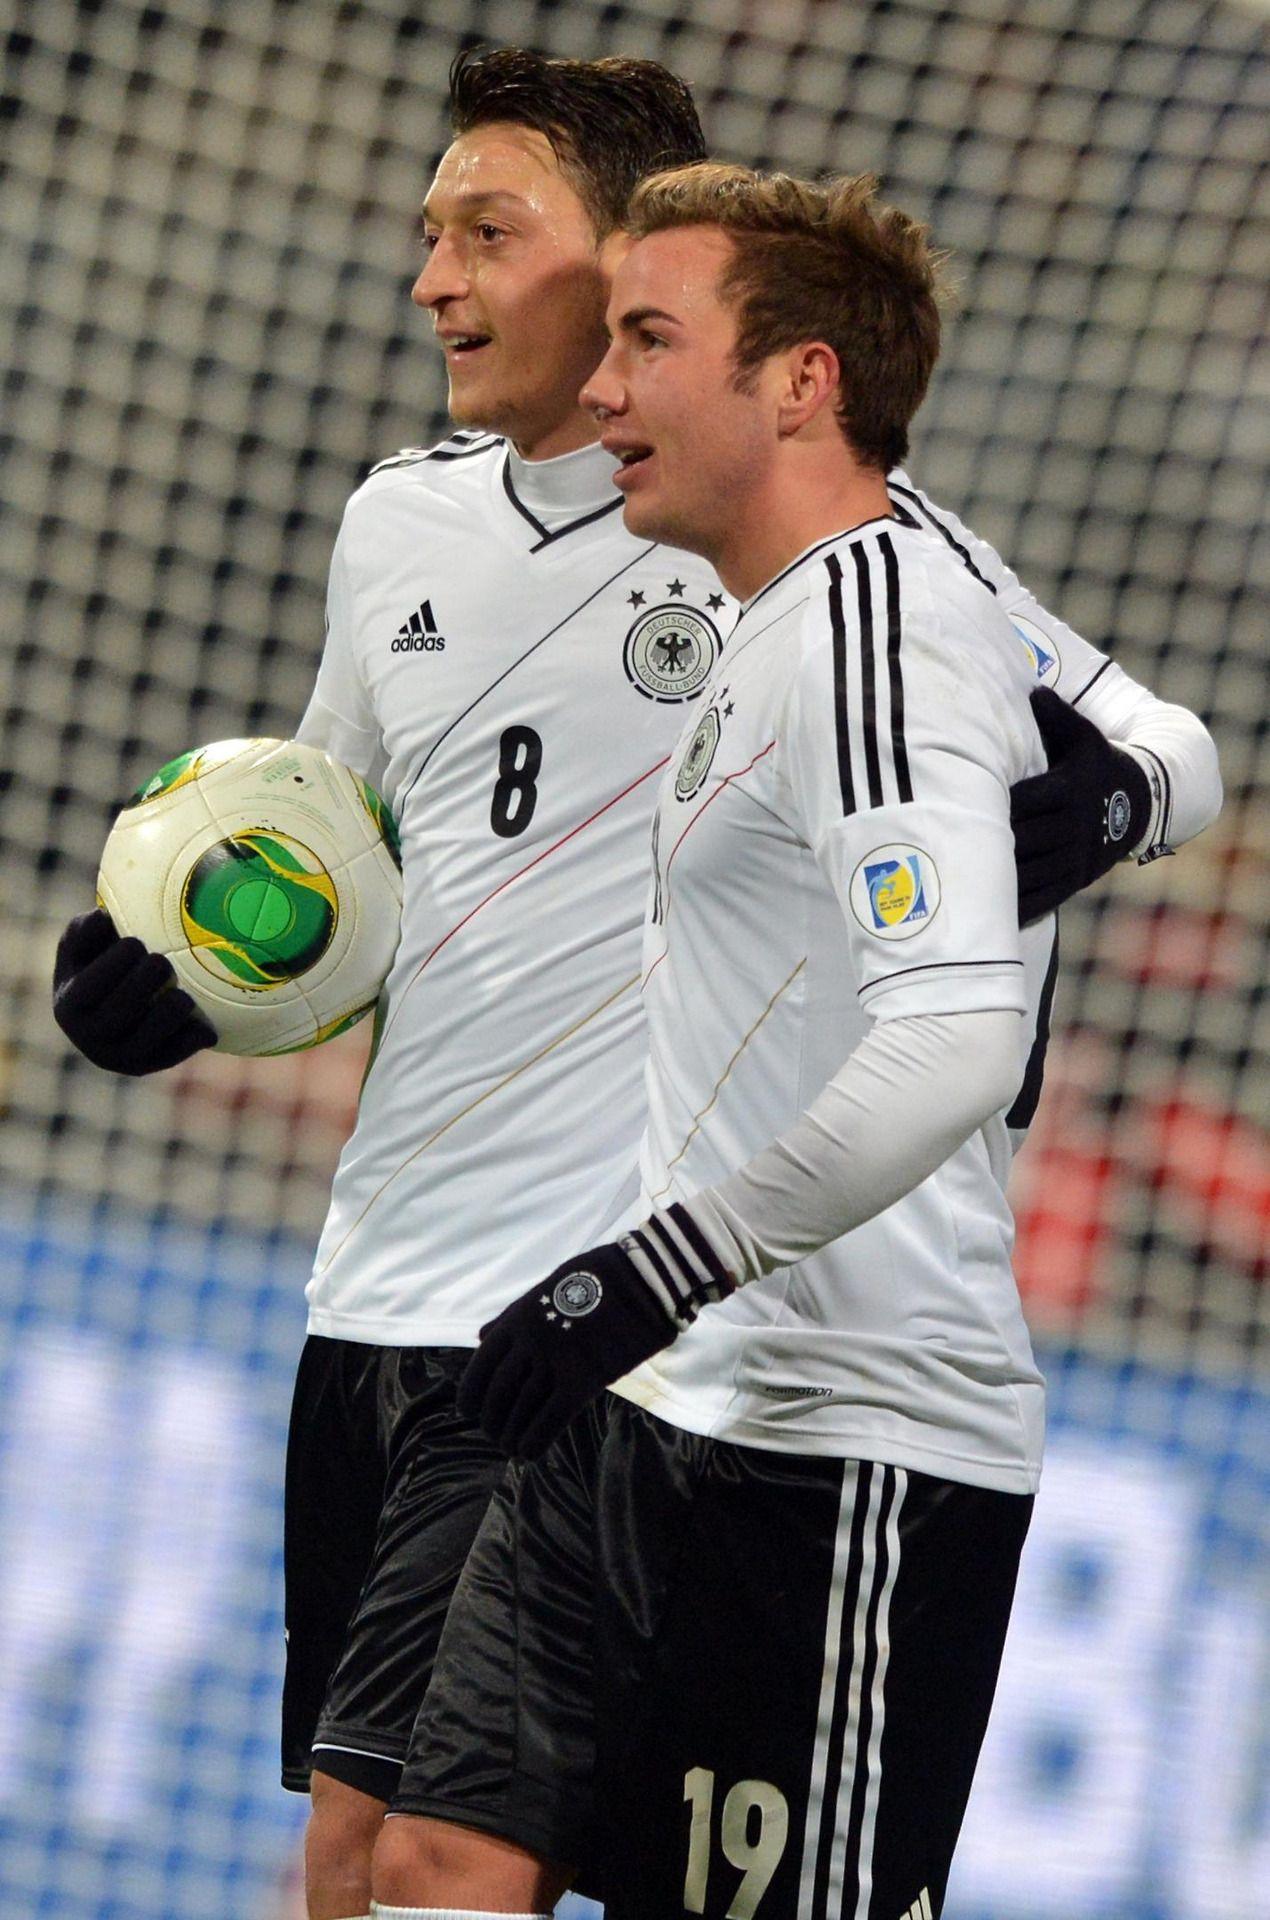 Mesut Ozil Mario Gotze Aka The Definition Of Perfection Germany Football Team Germany Football German Football Players